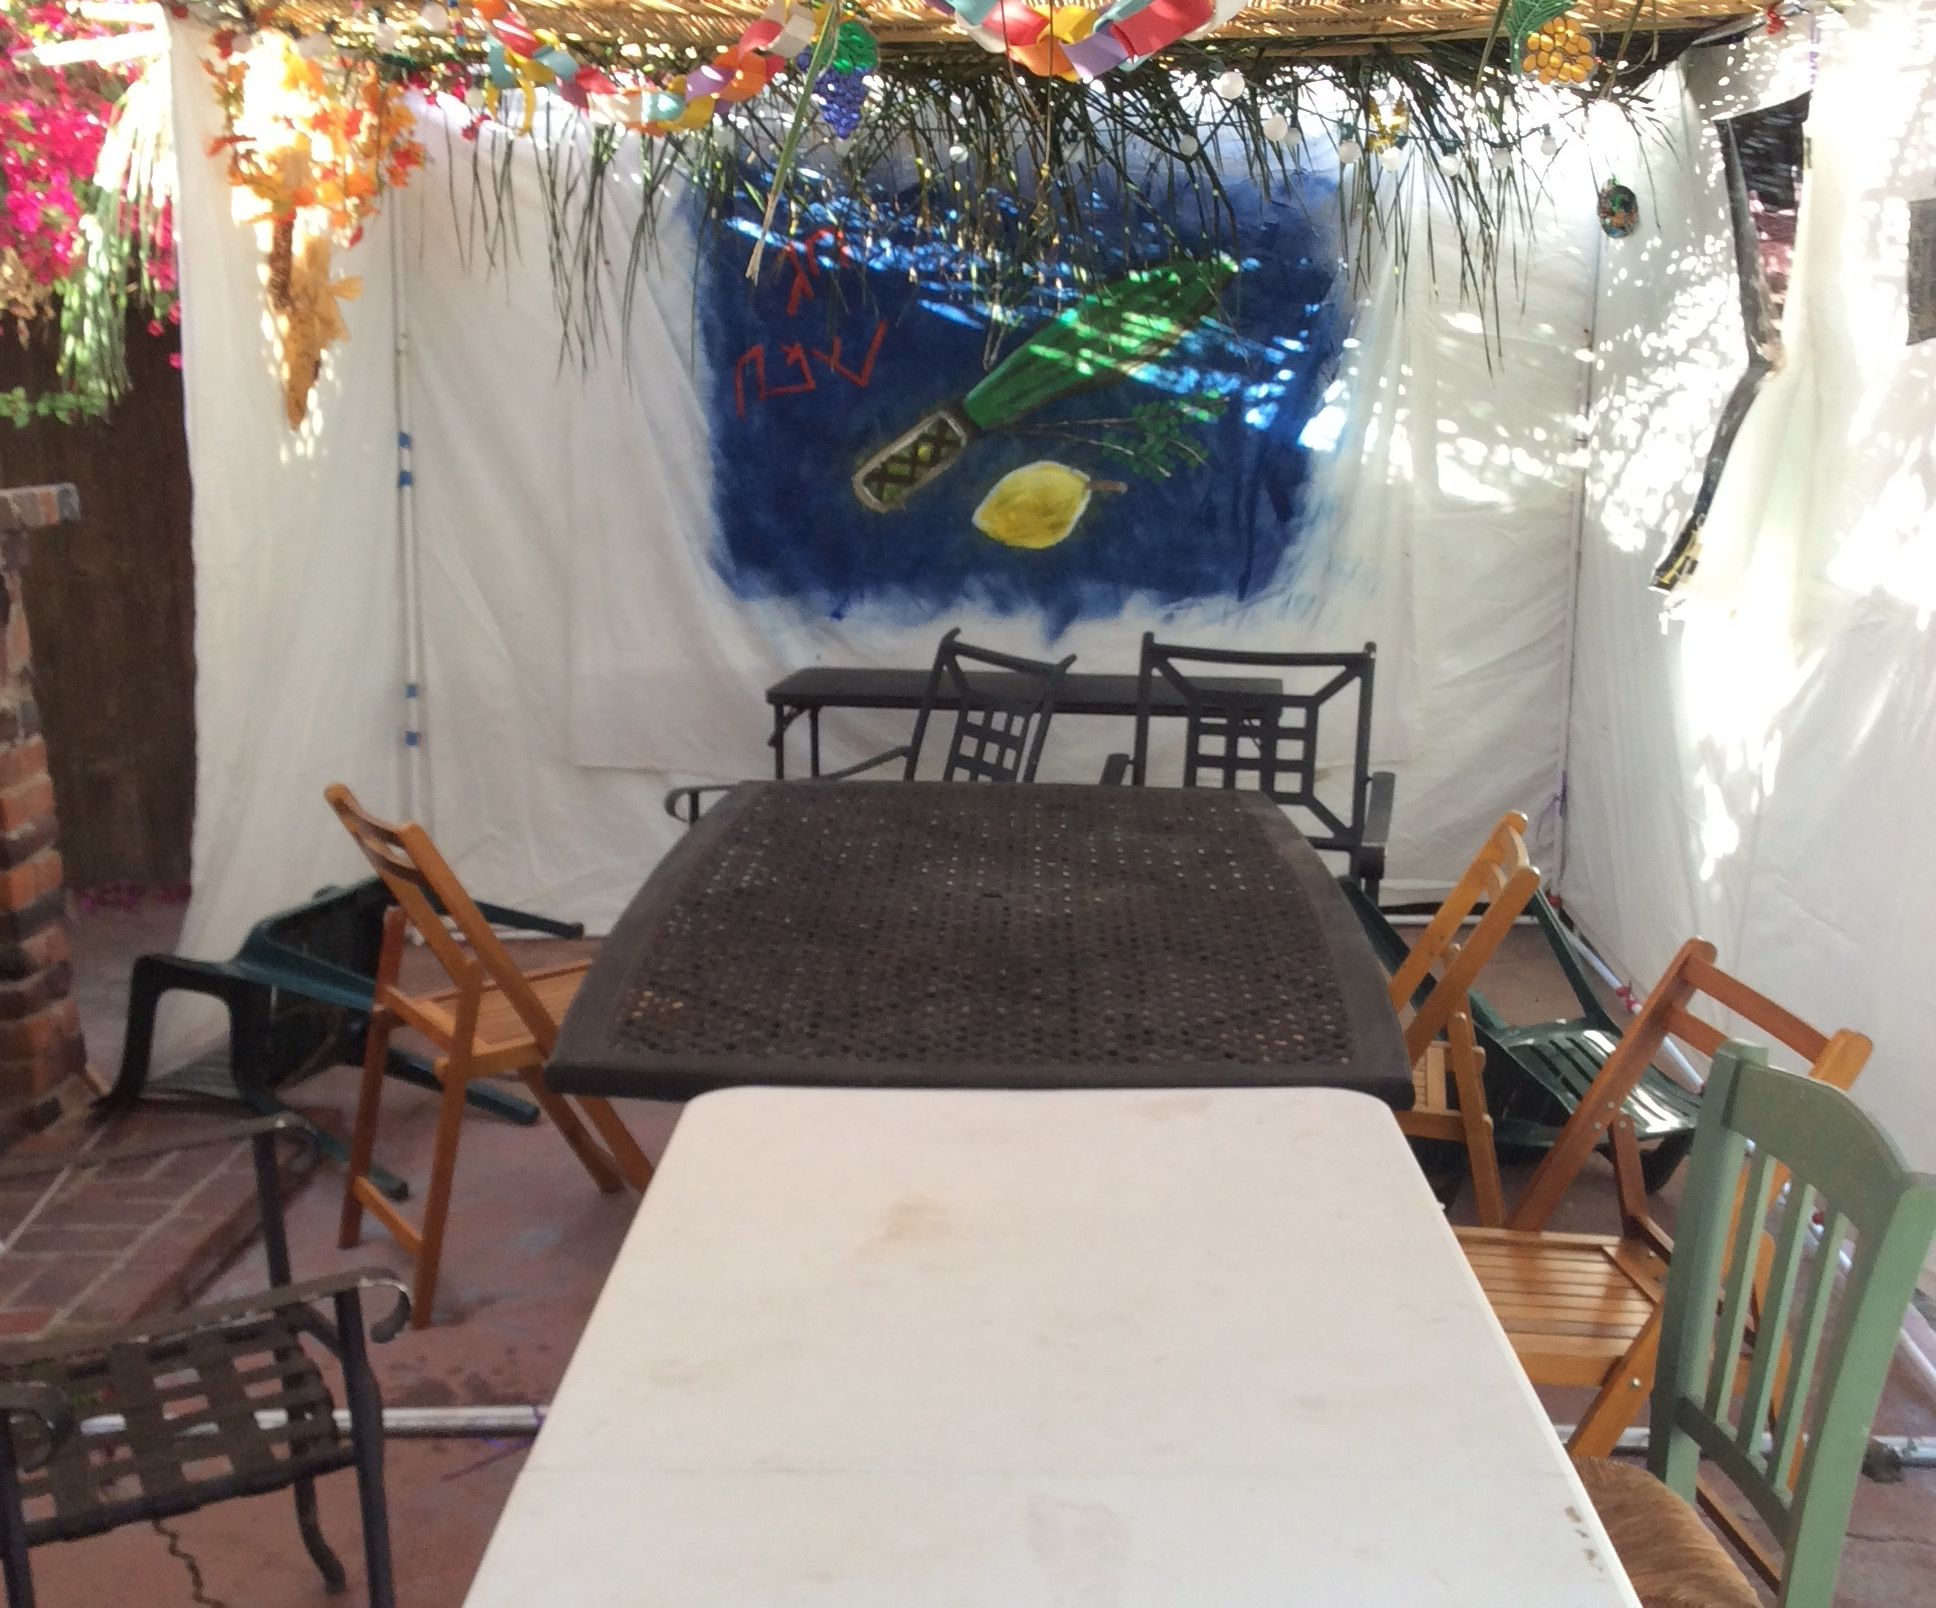 Build a Shelter (sukkah, booth, hut)